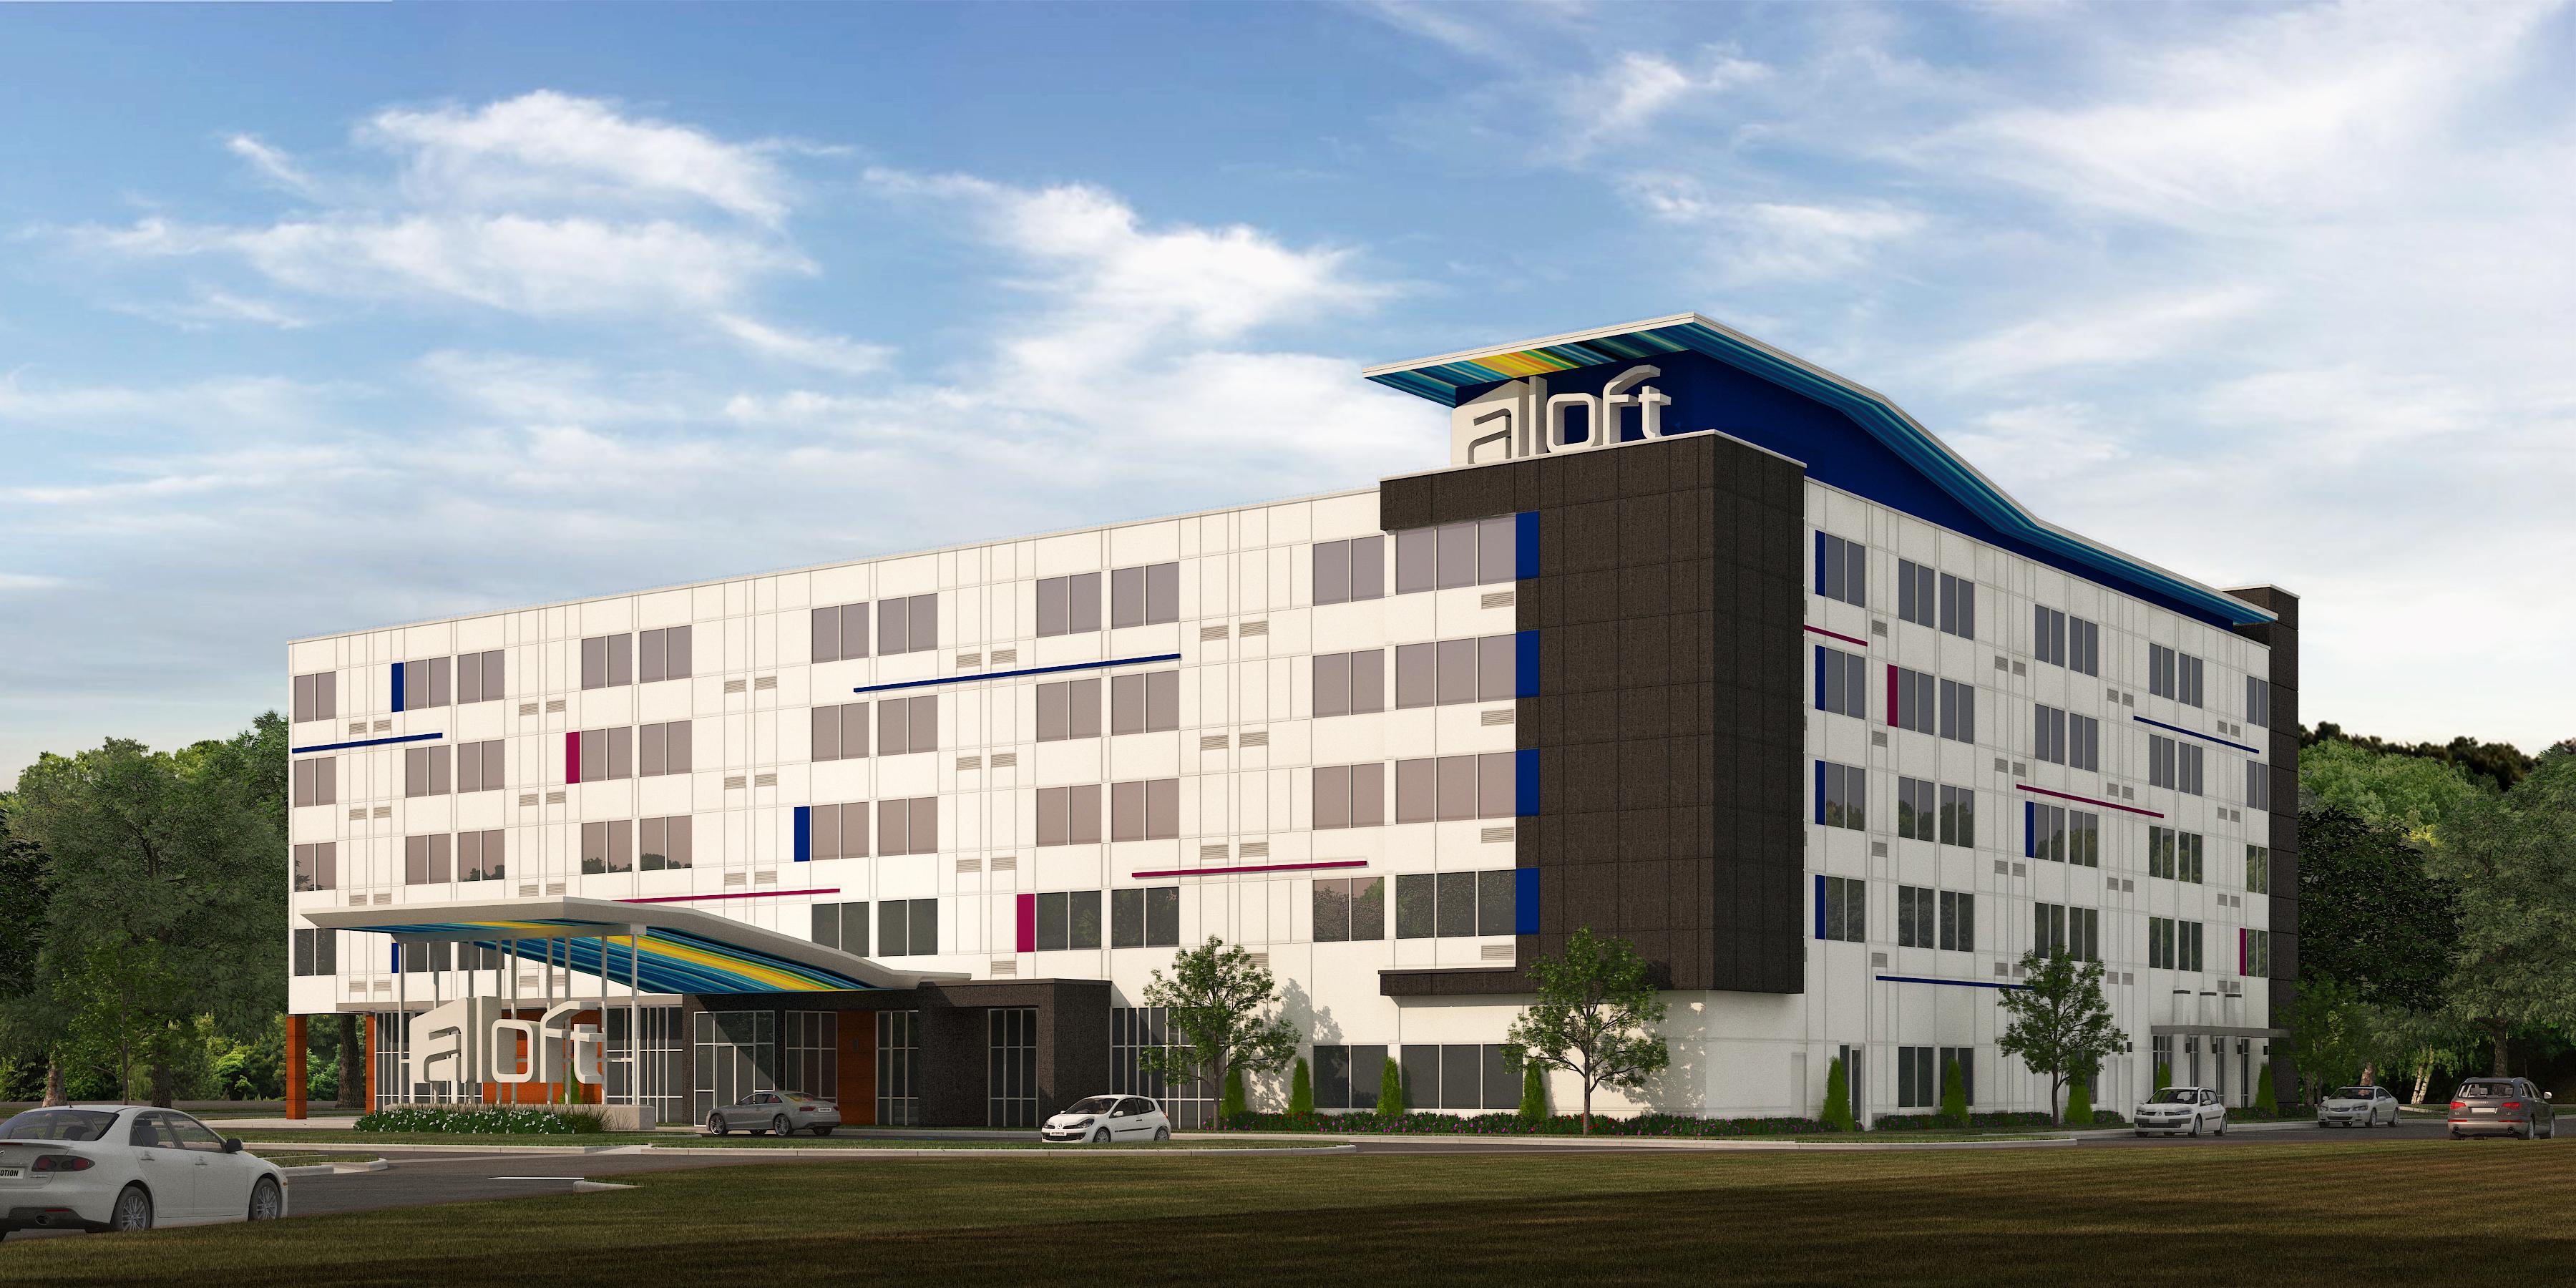 Aloft Hotel, Garza Ranch, Austin, Texas